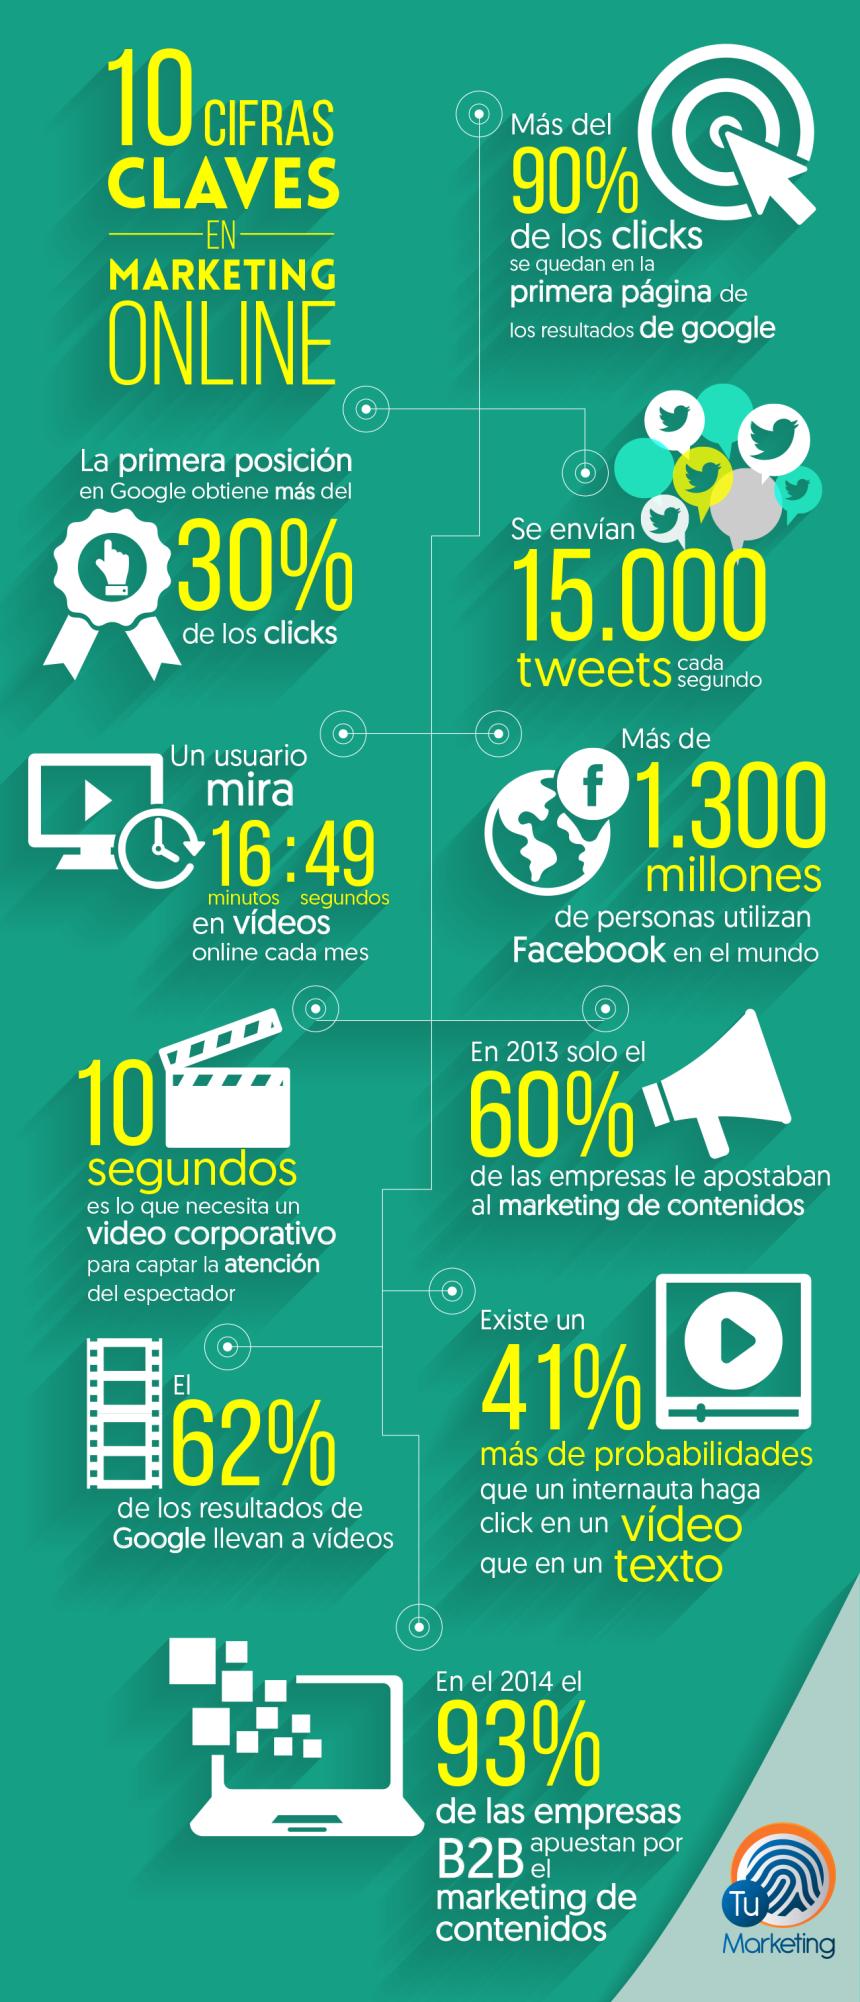 Las redes sociales que usamos a diario son poderosos instrumentos de marketing digital. Atrás van quedando técnicas obsoletas para dar paso a conceptos nuevos como marketing de contenidos, viralidad,engagement , branded content social, entre otras.